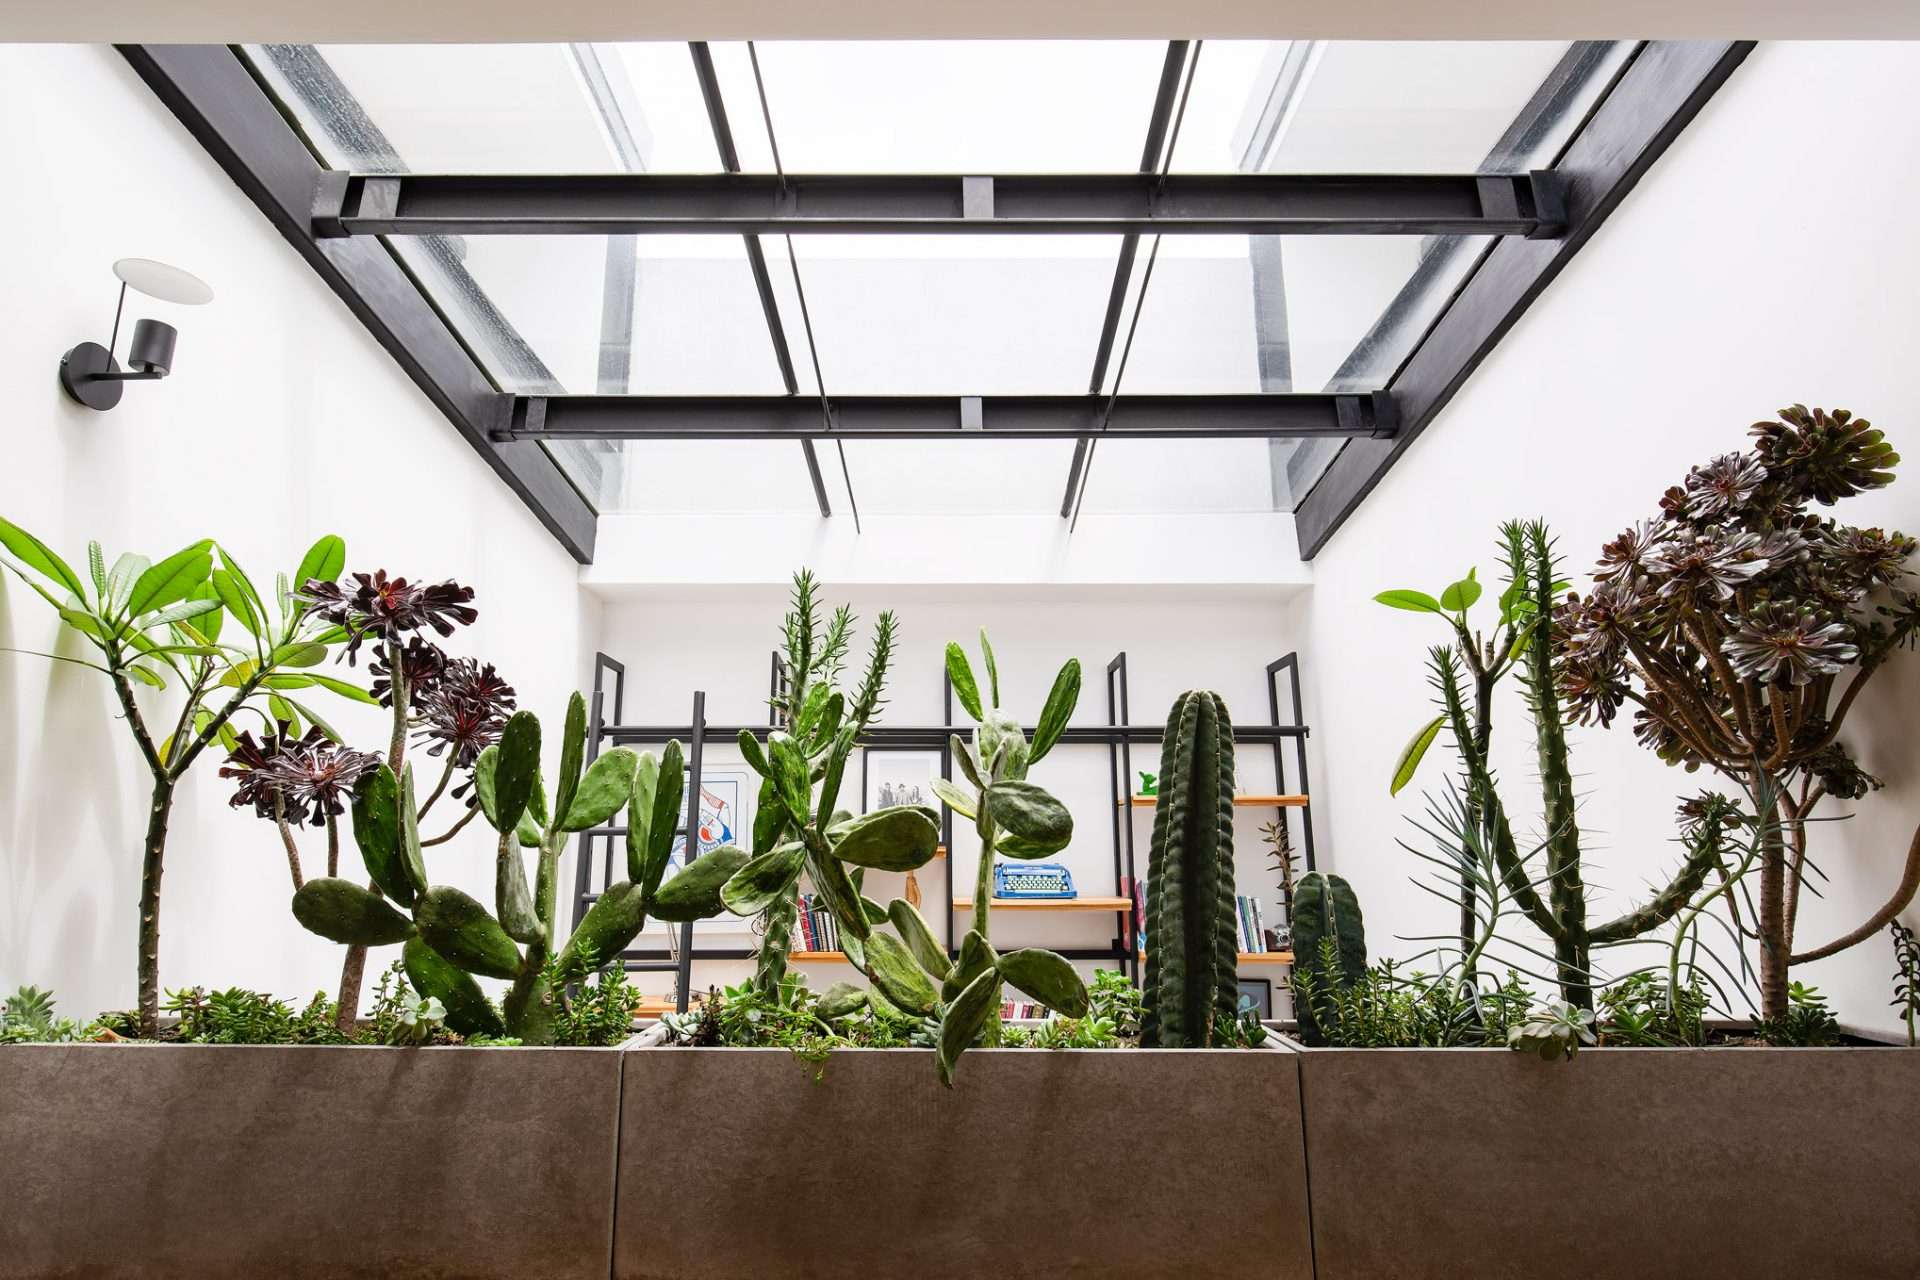 05.oberlaenderarquitectos.arquitectura.simonboschphotography.simon.bosch.bogota.interior.habitar